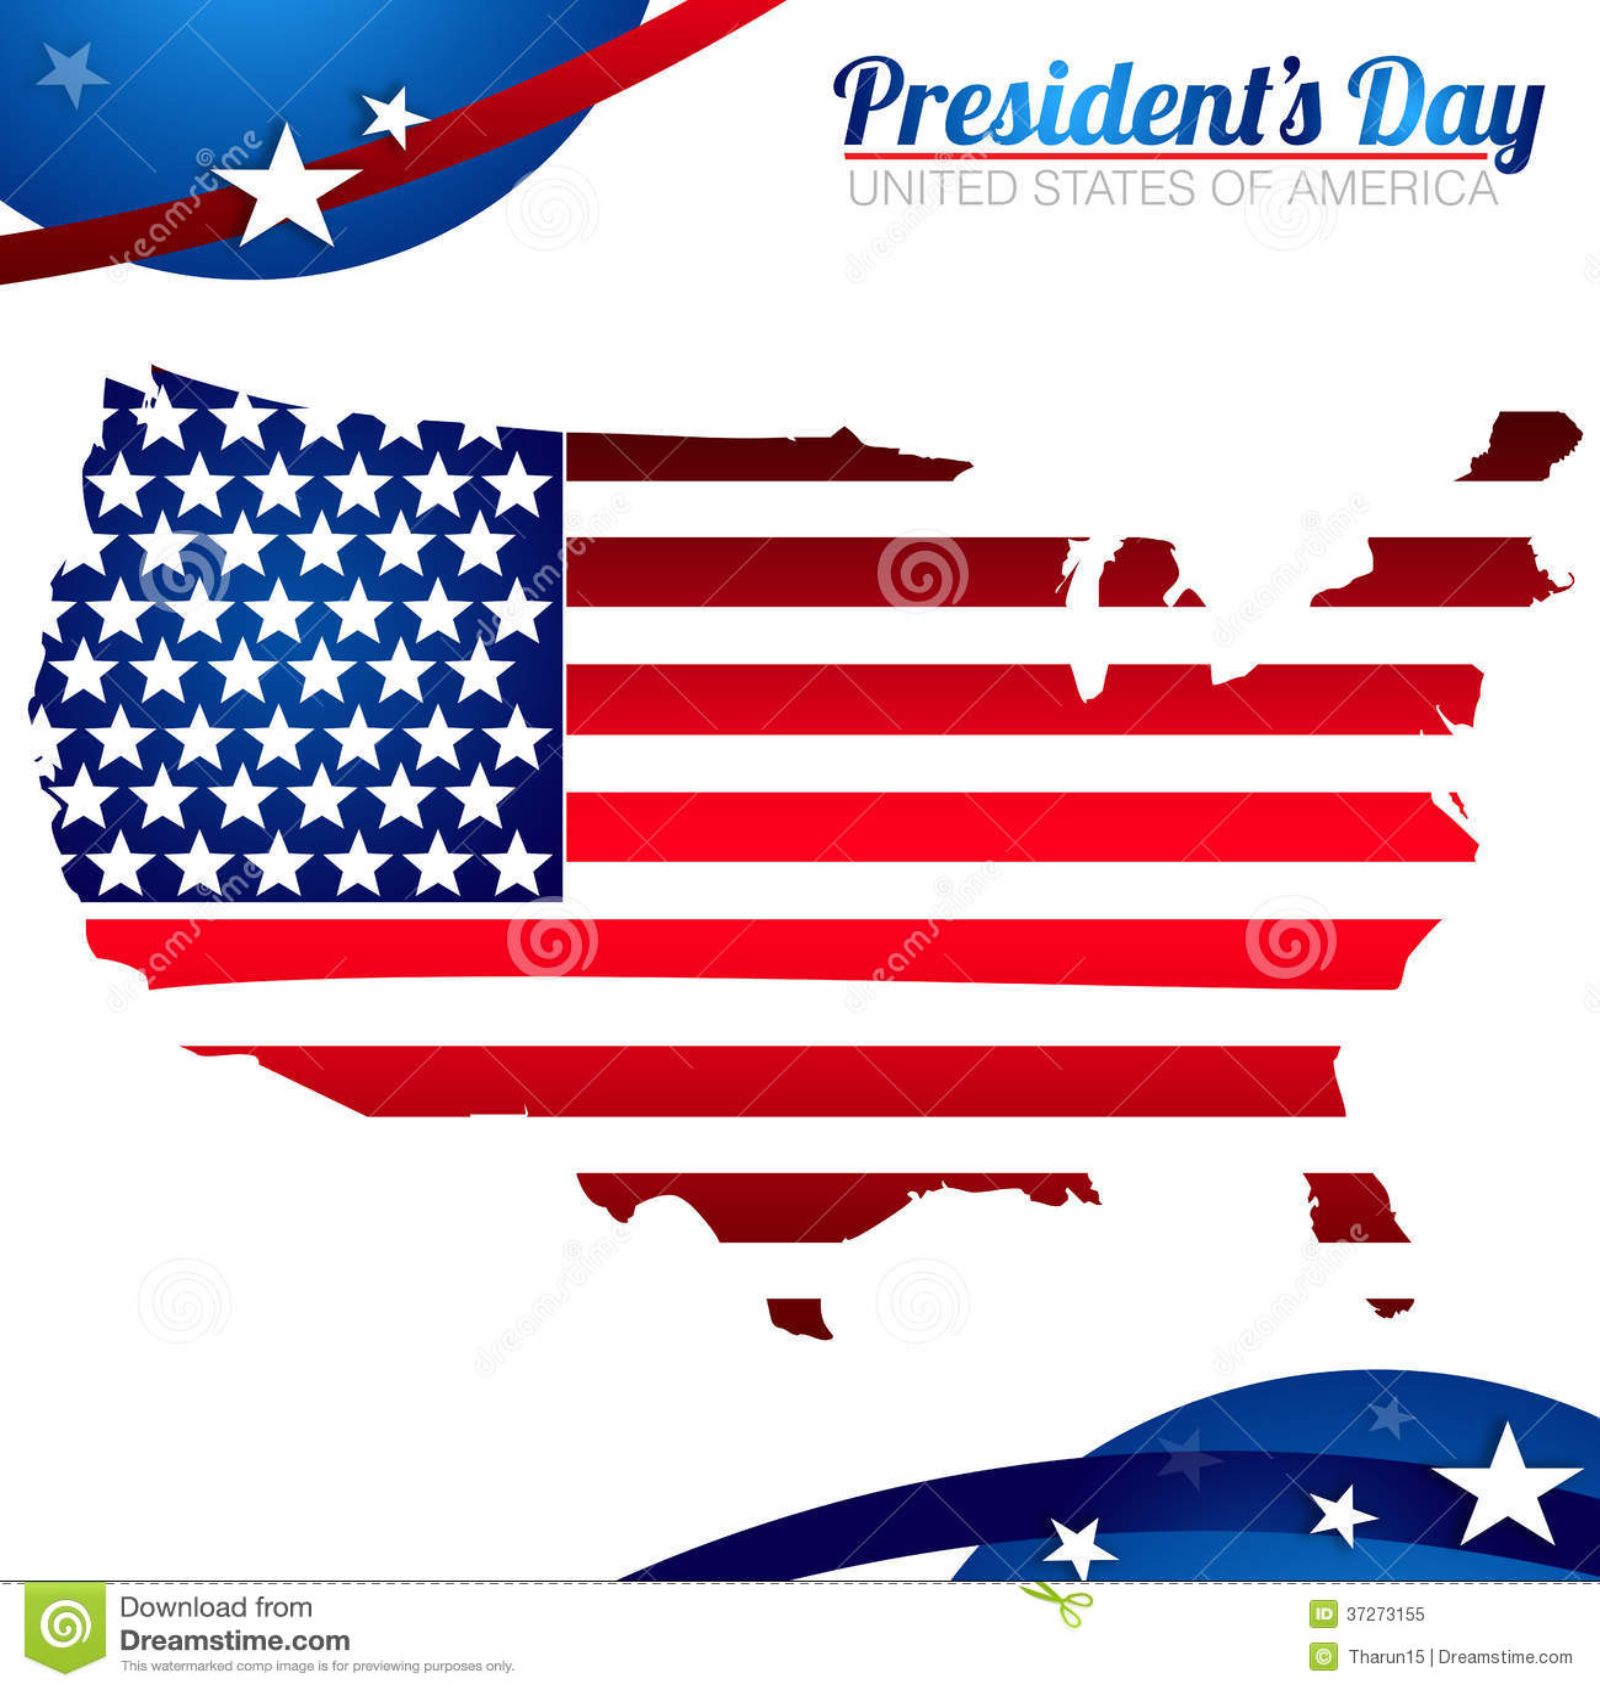 President Day Background Royalty Free Stock Photo